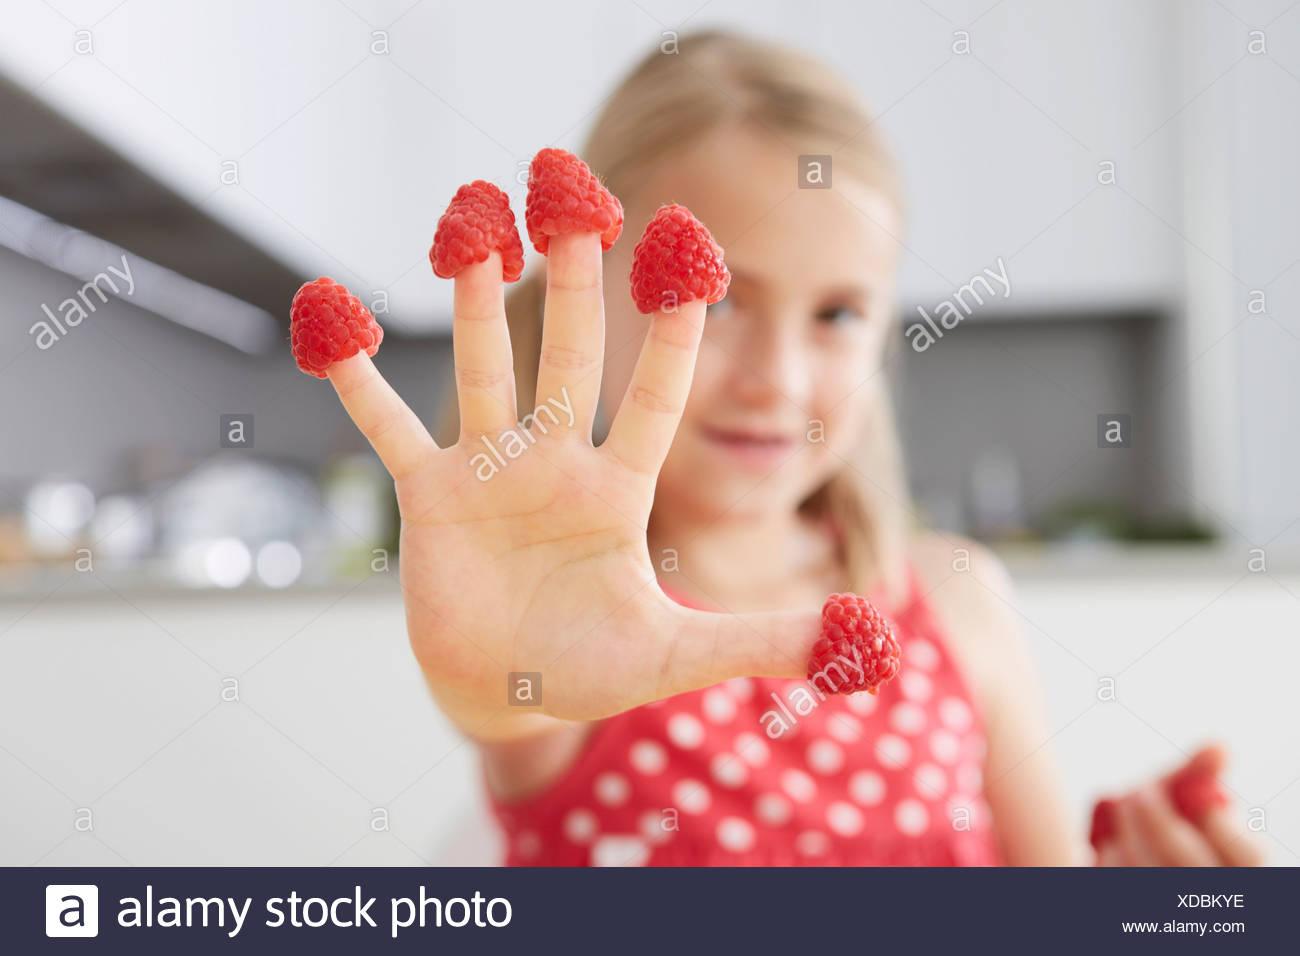 Girl putting raspberries on fingers Stock Photo